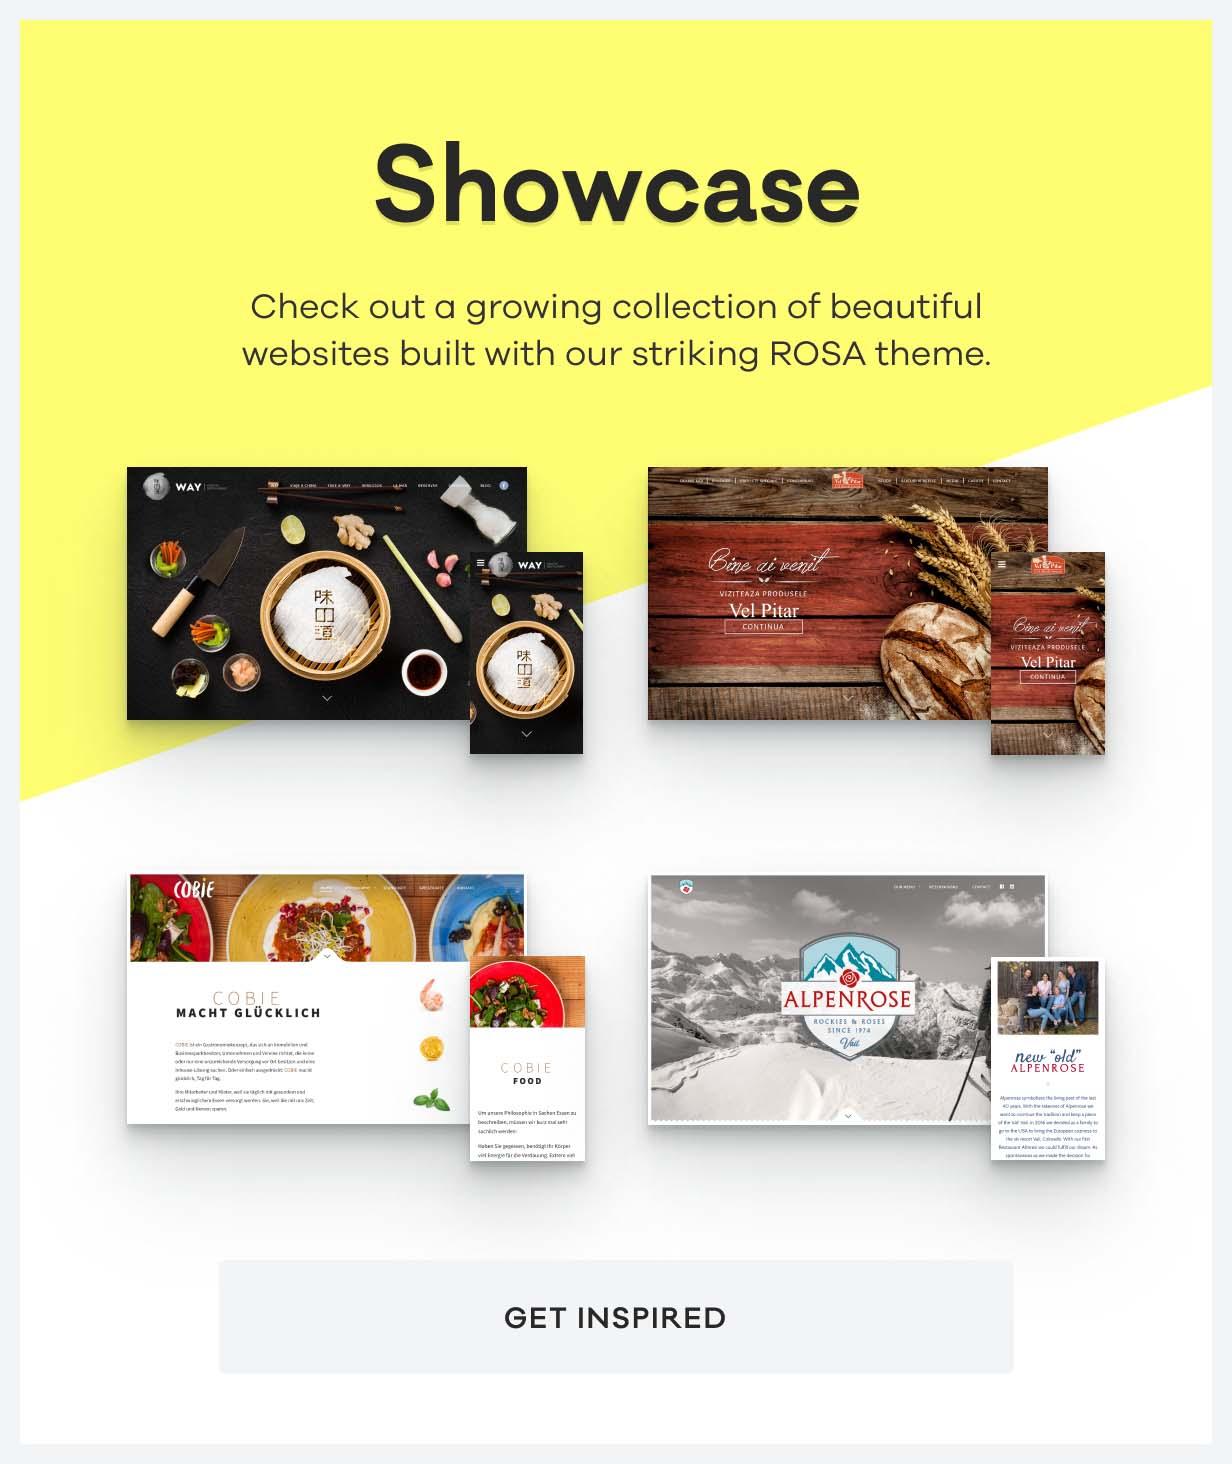 rosa showcase - ROSA 1 - An Exquisite Restaurant WordPress Theme